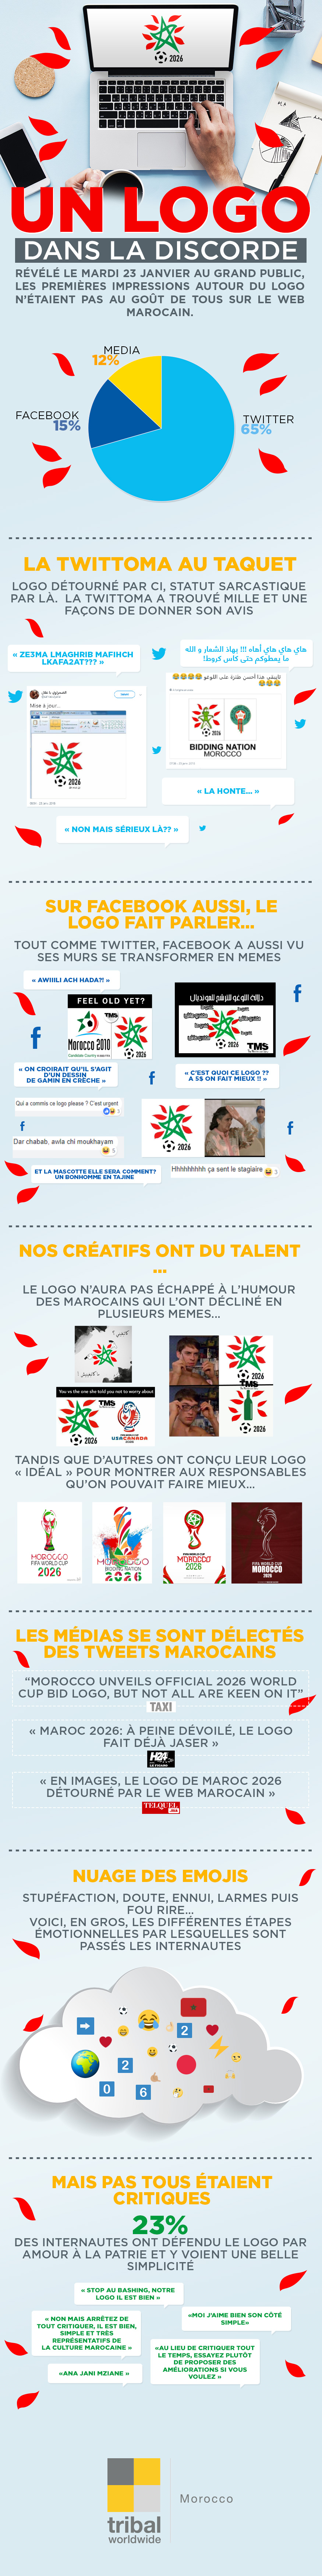 infographie-logo-maroc-2026 (1)